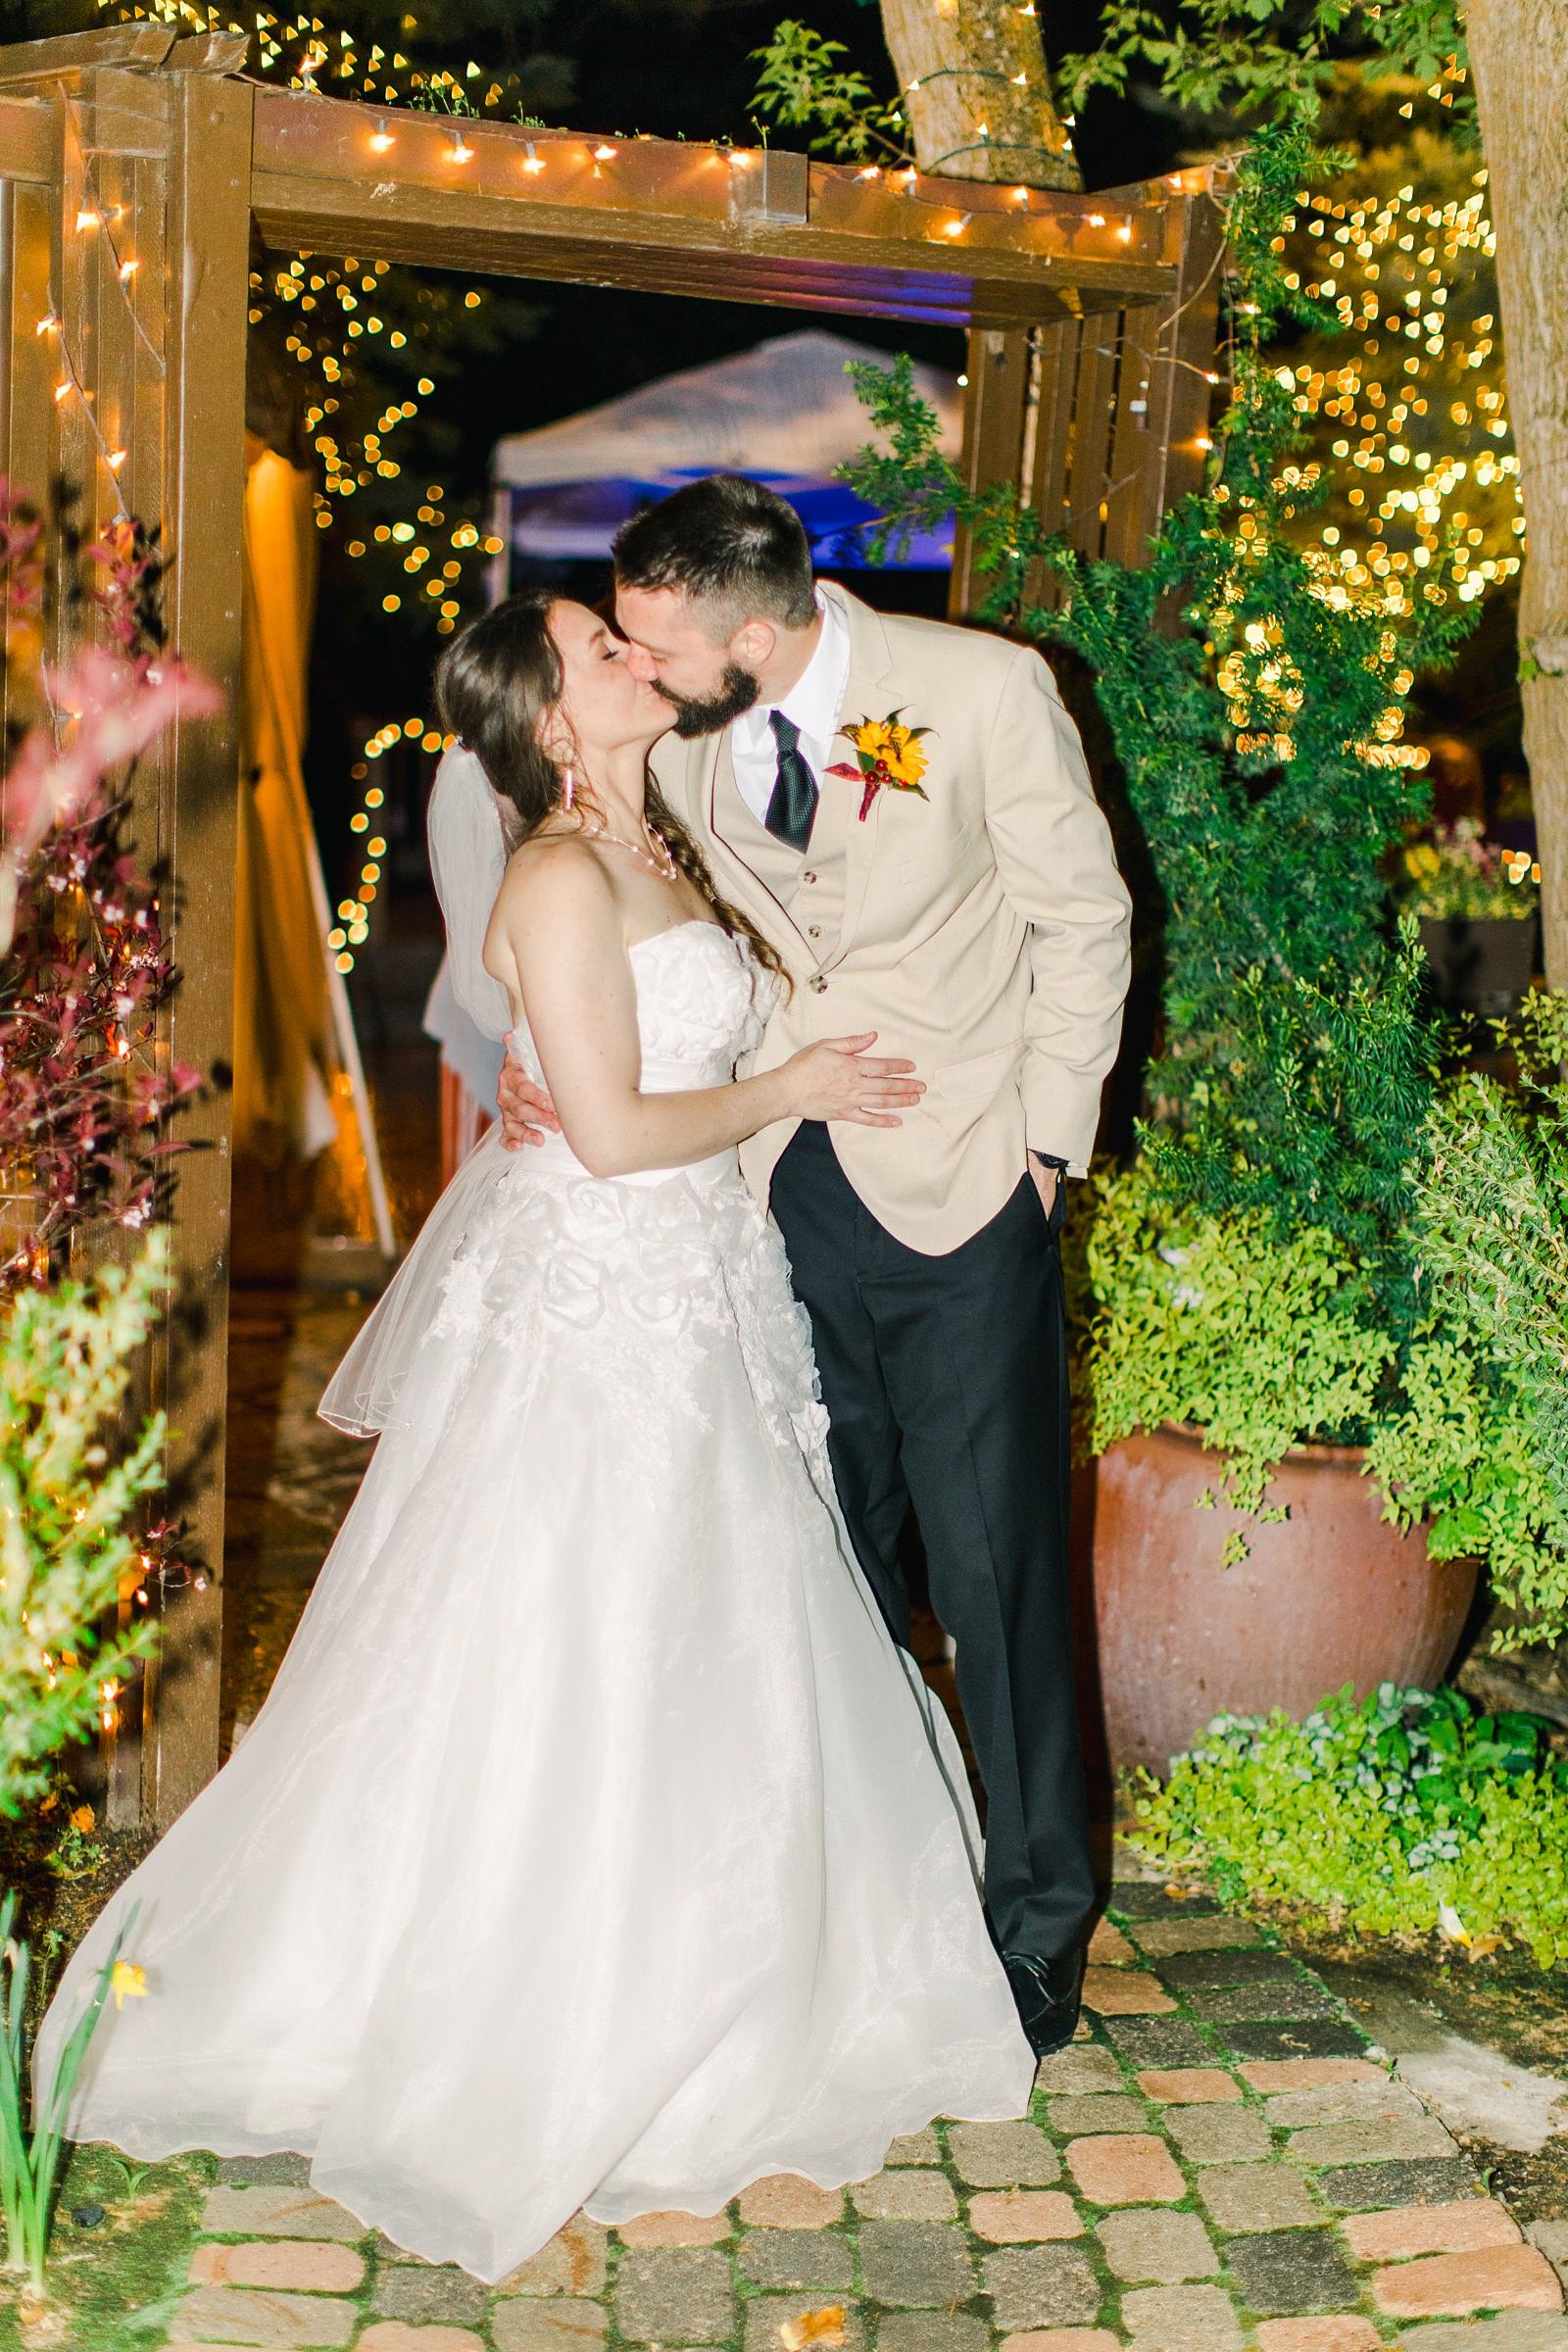 Millcreek Inn Summer Wedding, Utah wedding photography Millcreek Canyon, Salt Lake City